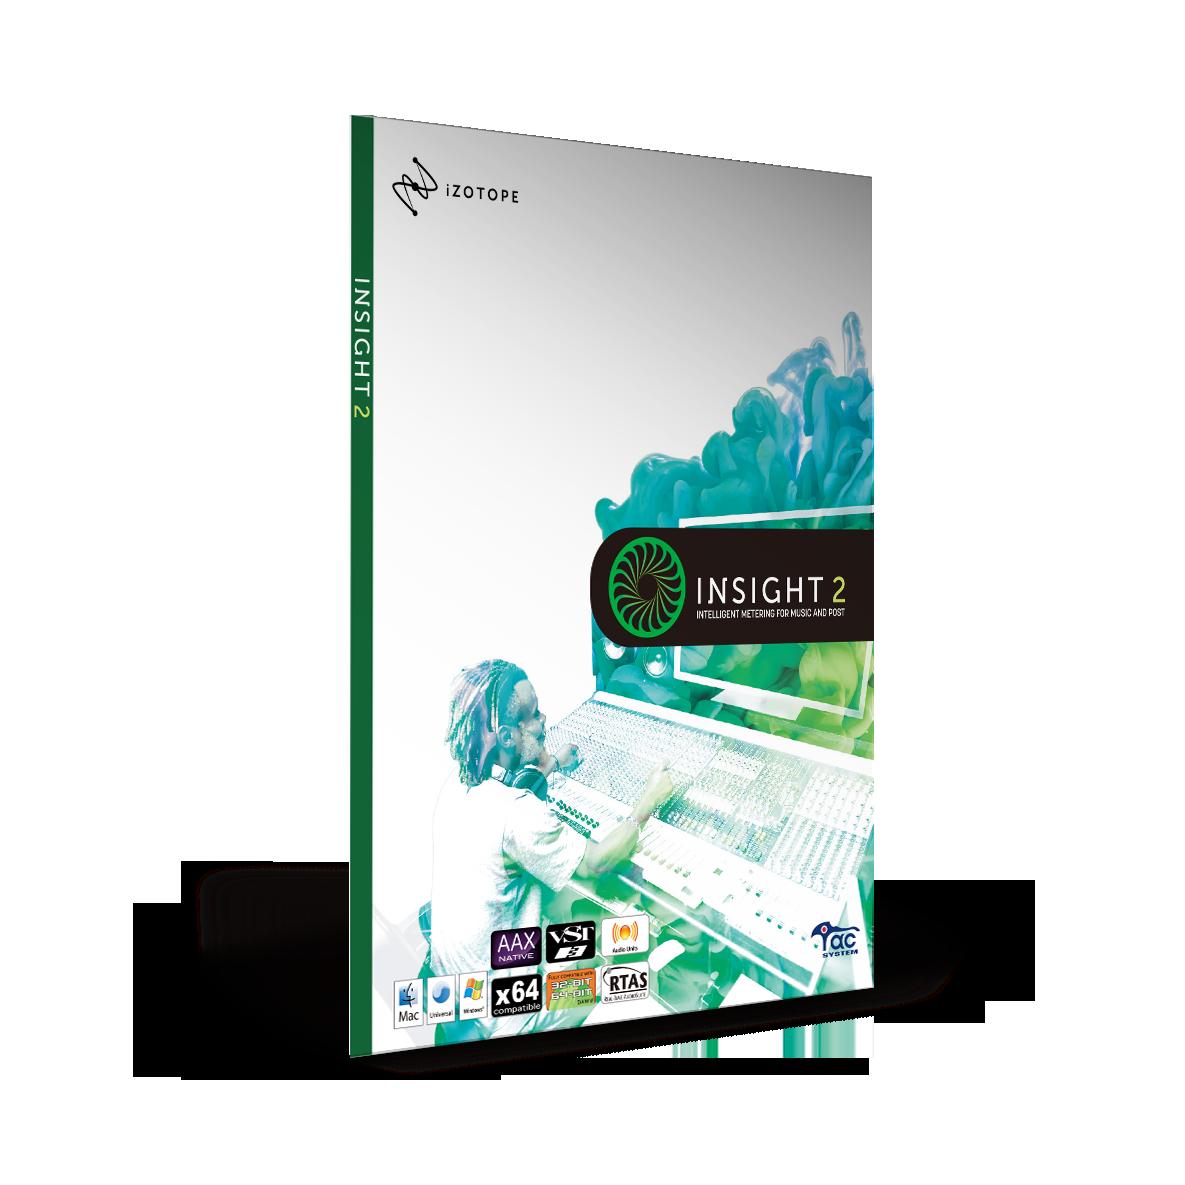 Insight2